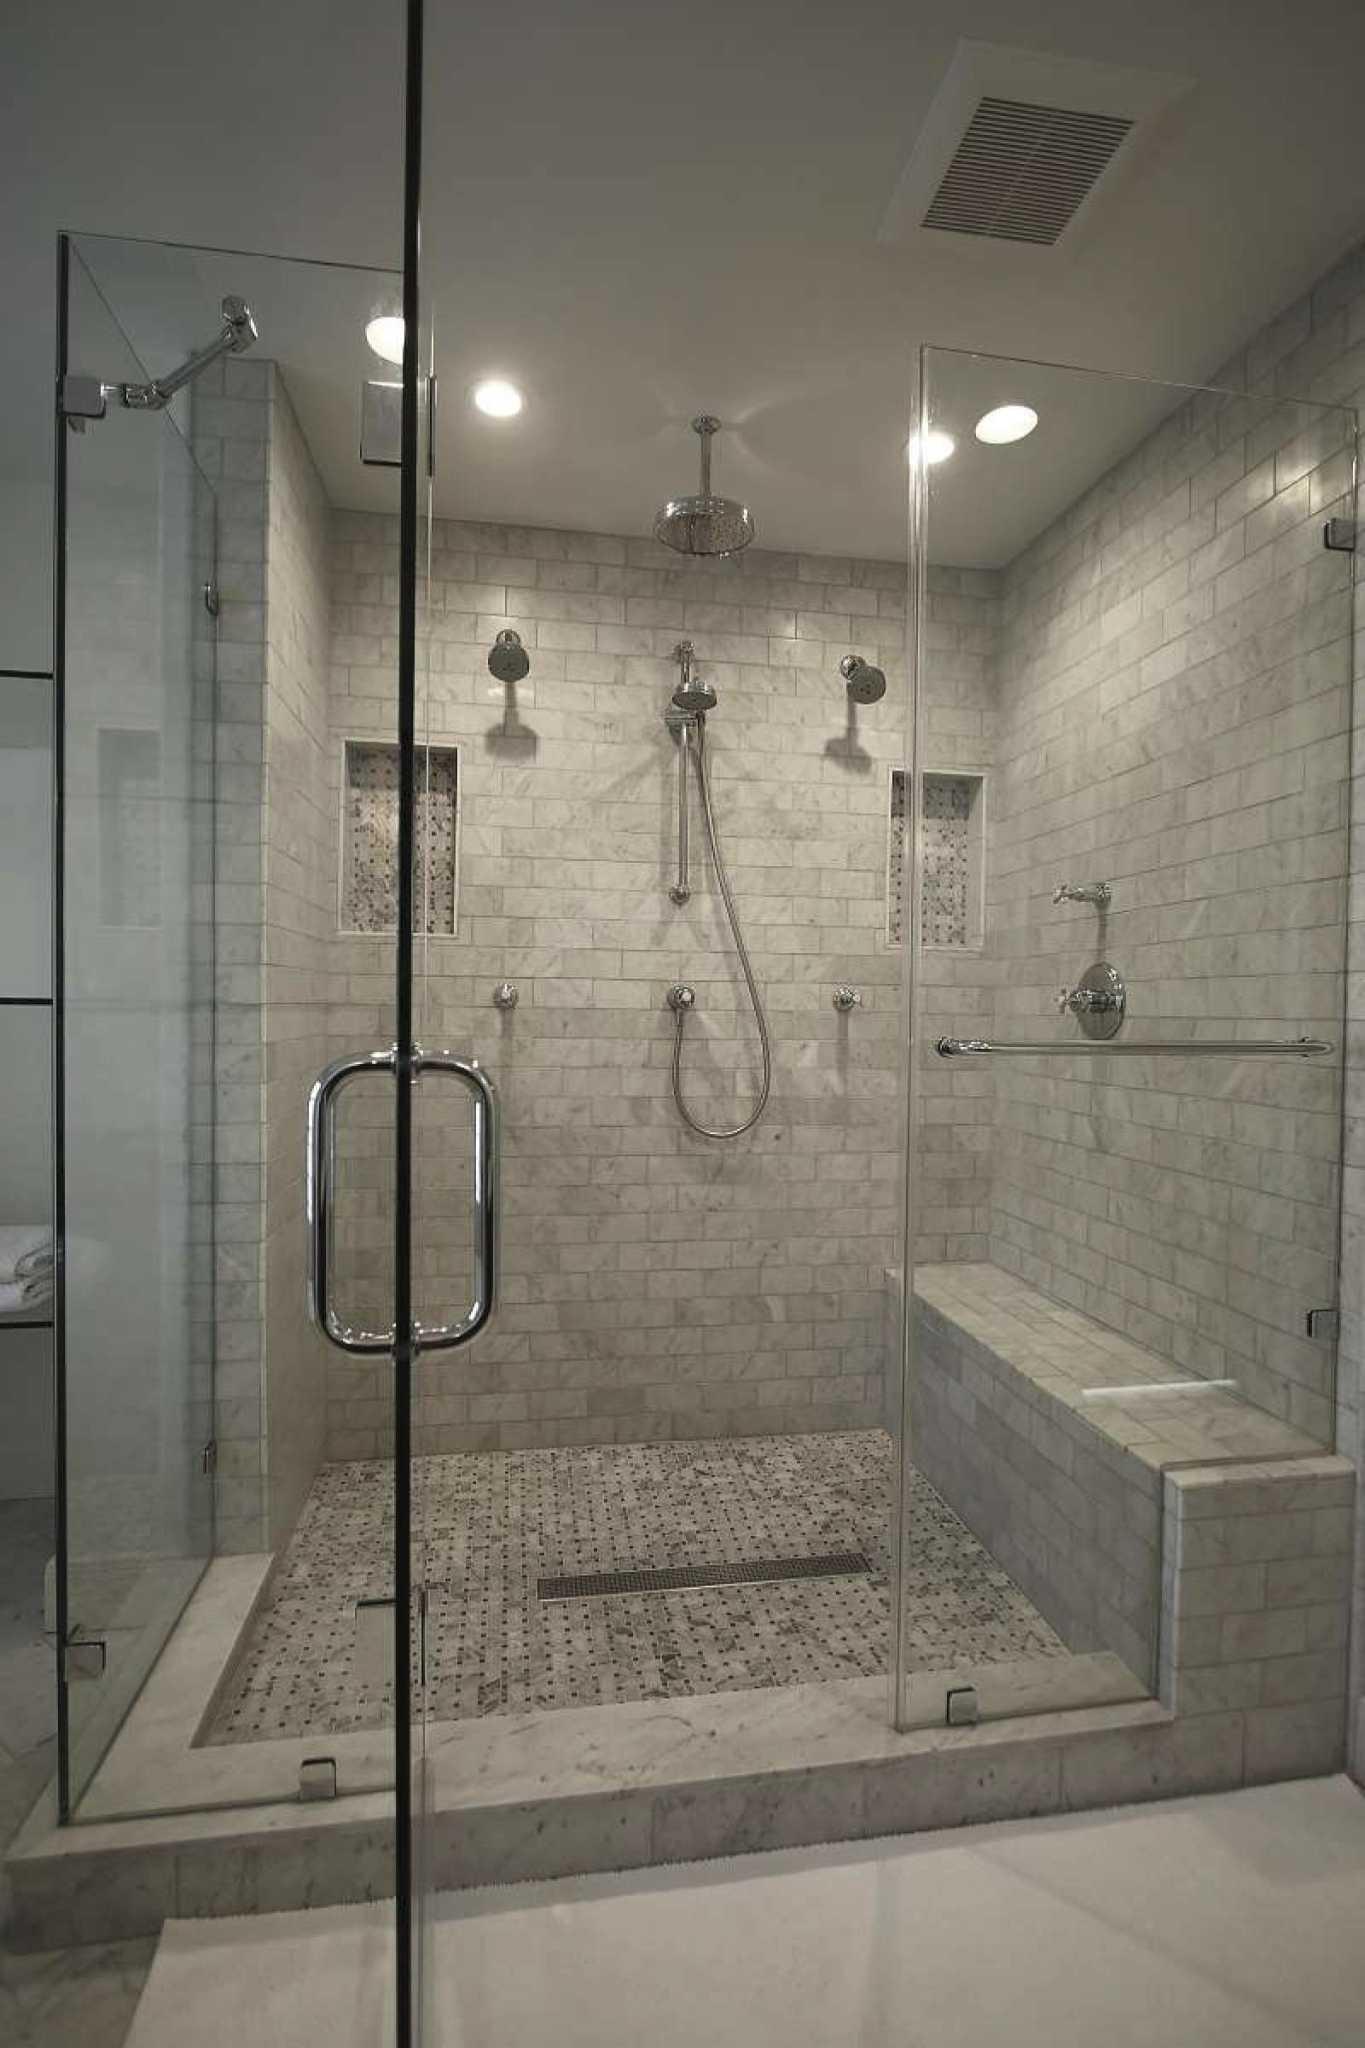 Sleek Modern Shower Doors Provide Streamlined Look